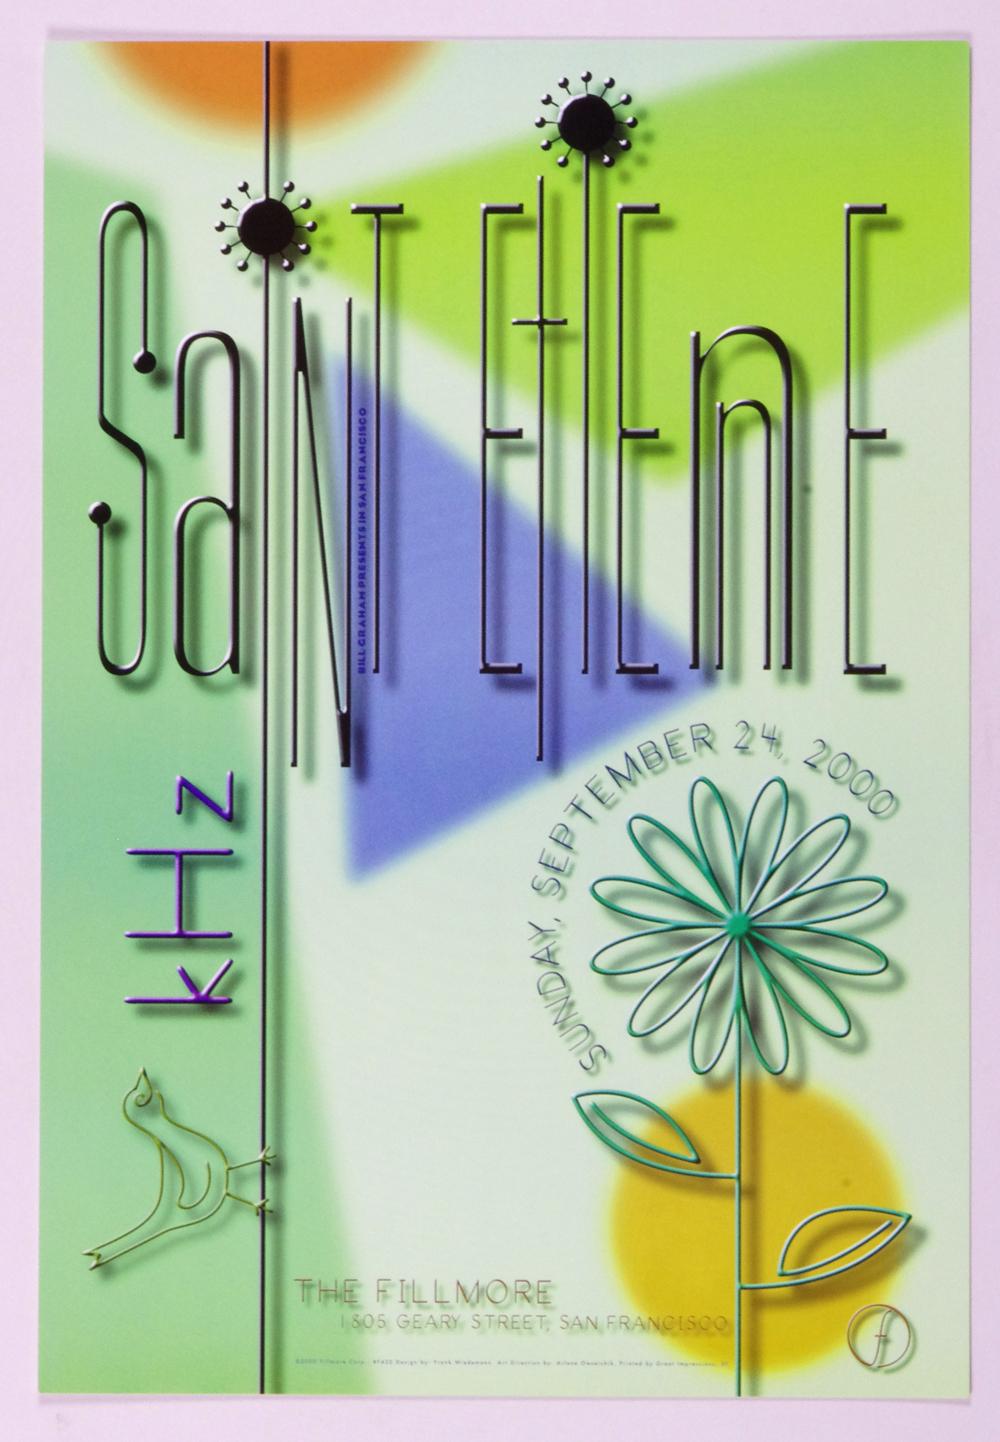 Saint Etienne Poster 2000 Sep 24 New Fillmore